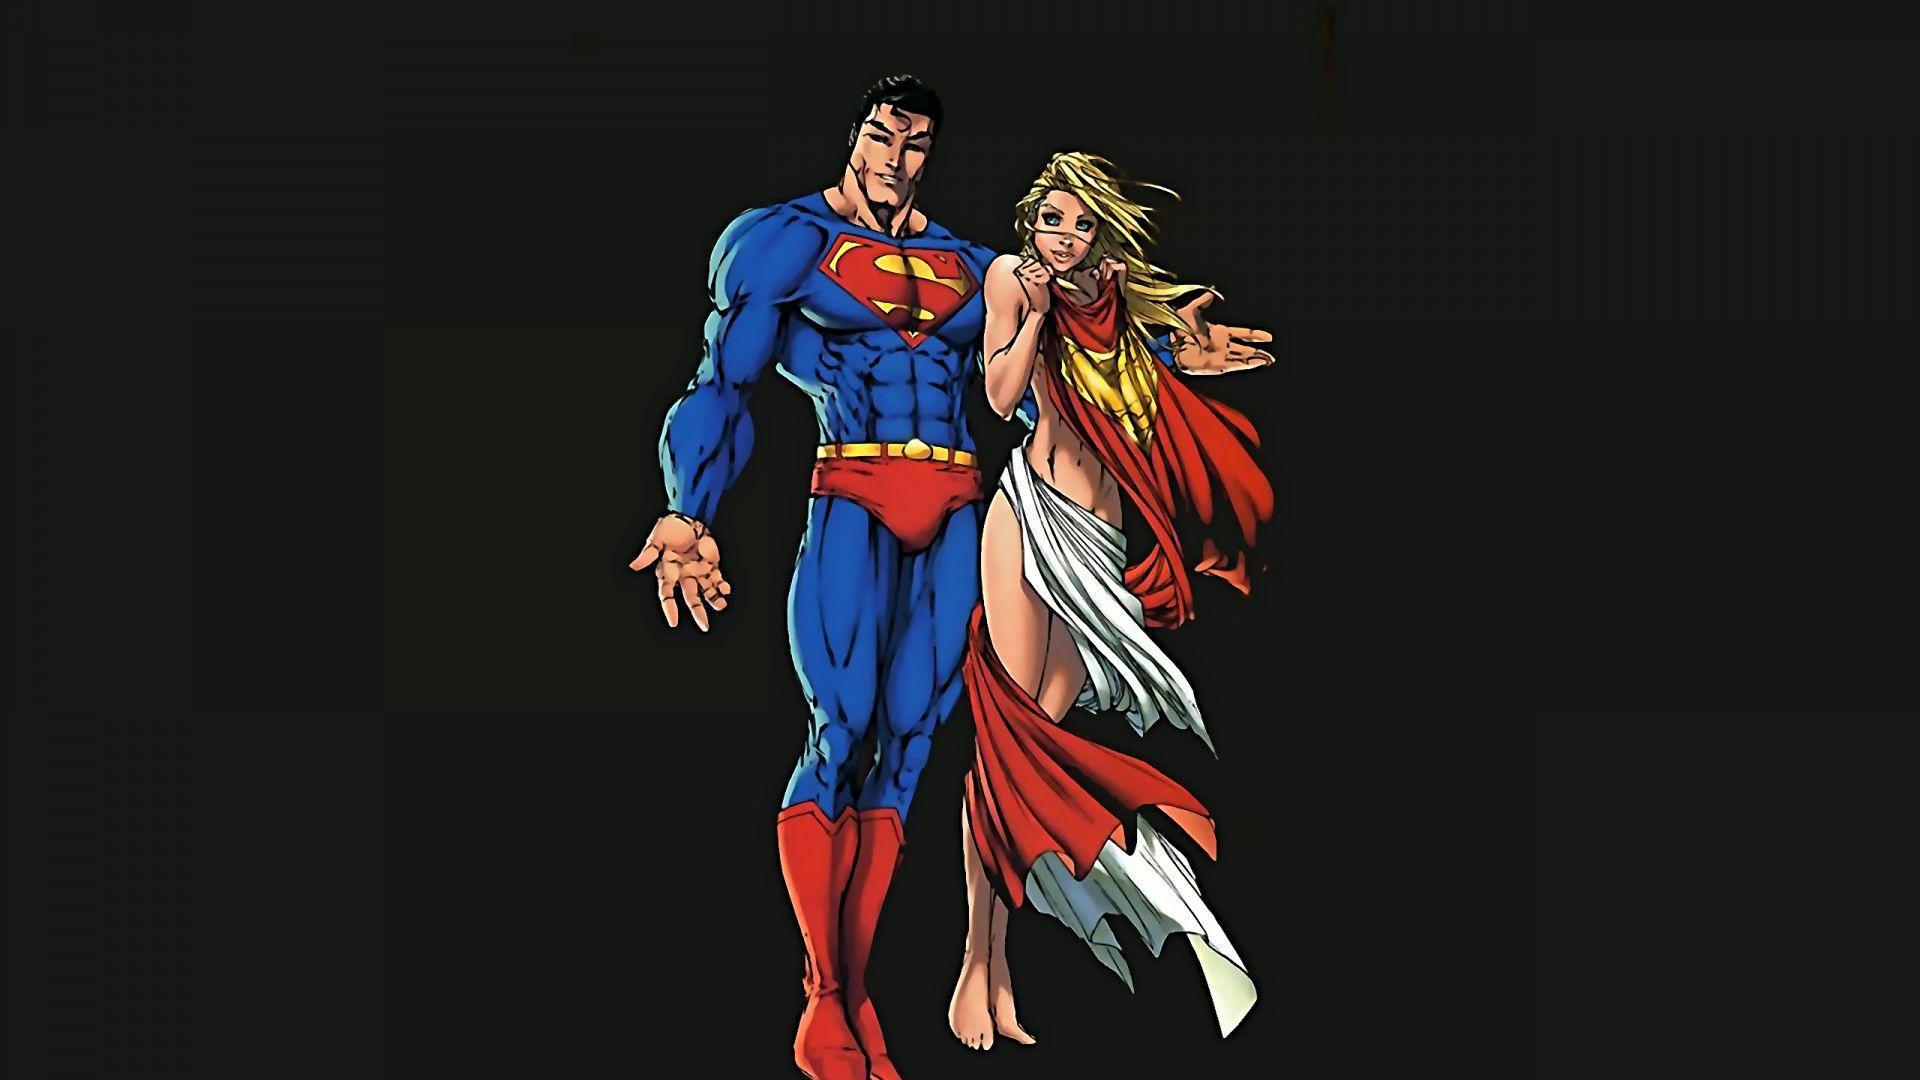 Wallpaper Super man and super girl minimalism, artwork